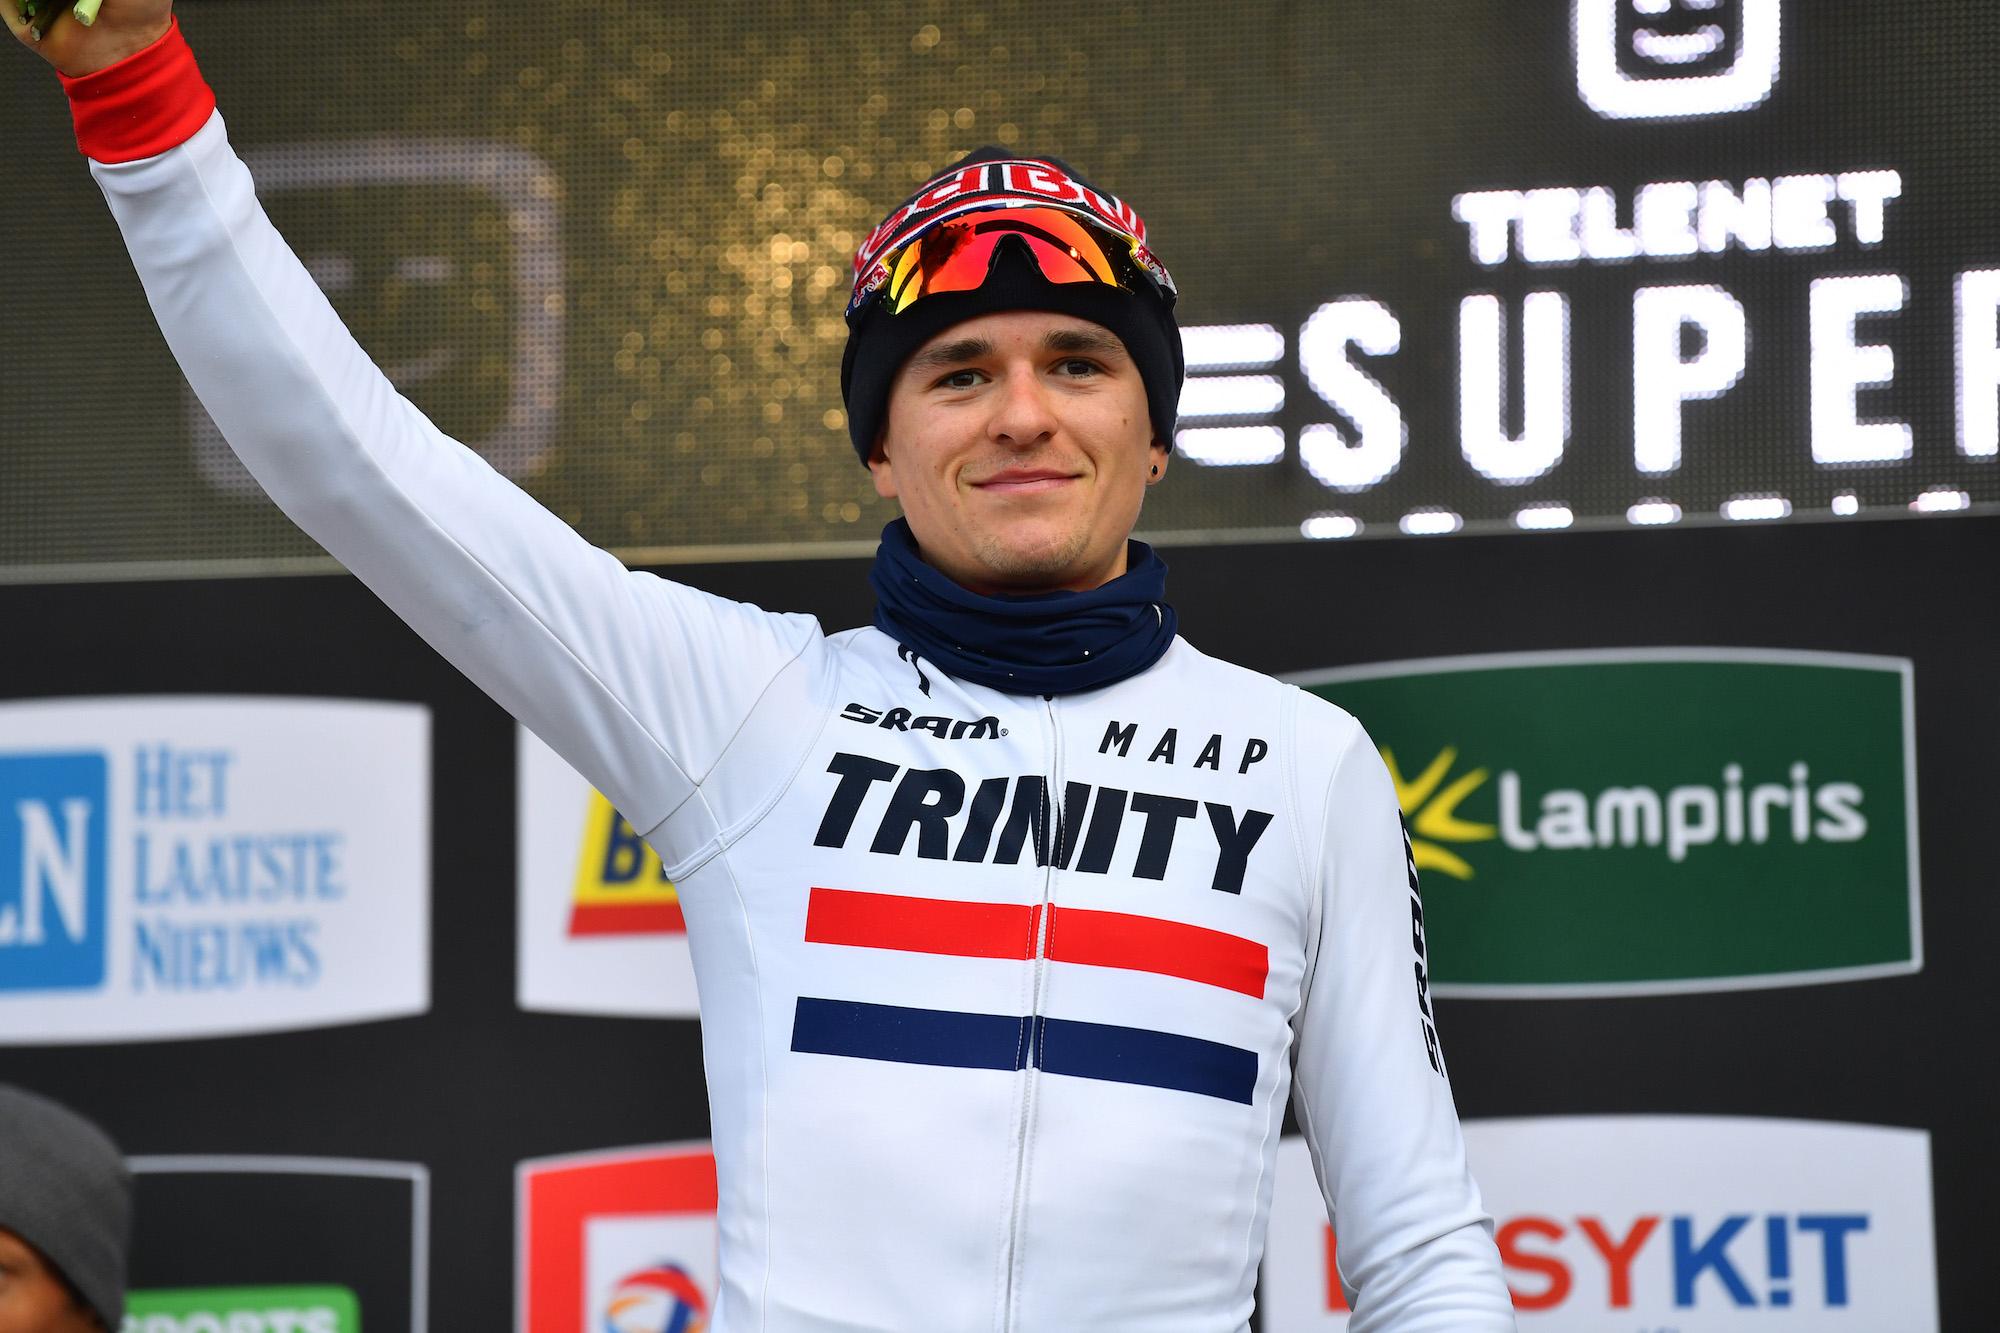 Tom Pidcock farà il suo debutto in Ineos Grenadiers al Tour du Haut Var insieme a Geraint Thomas